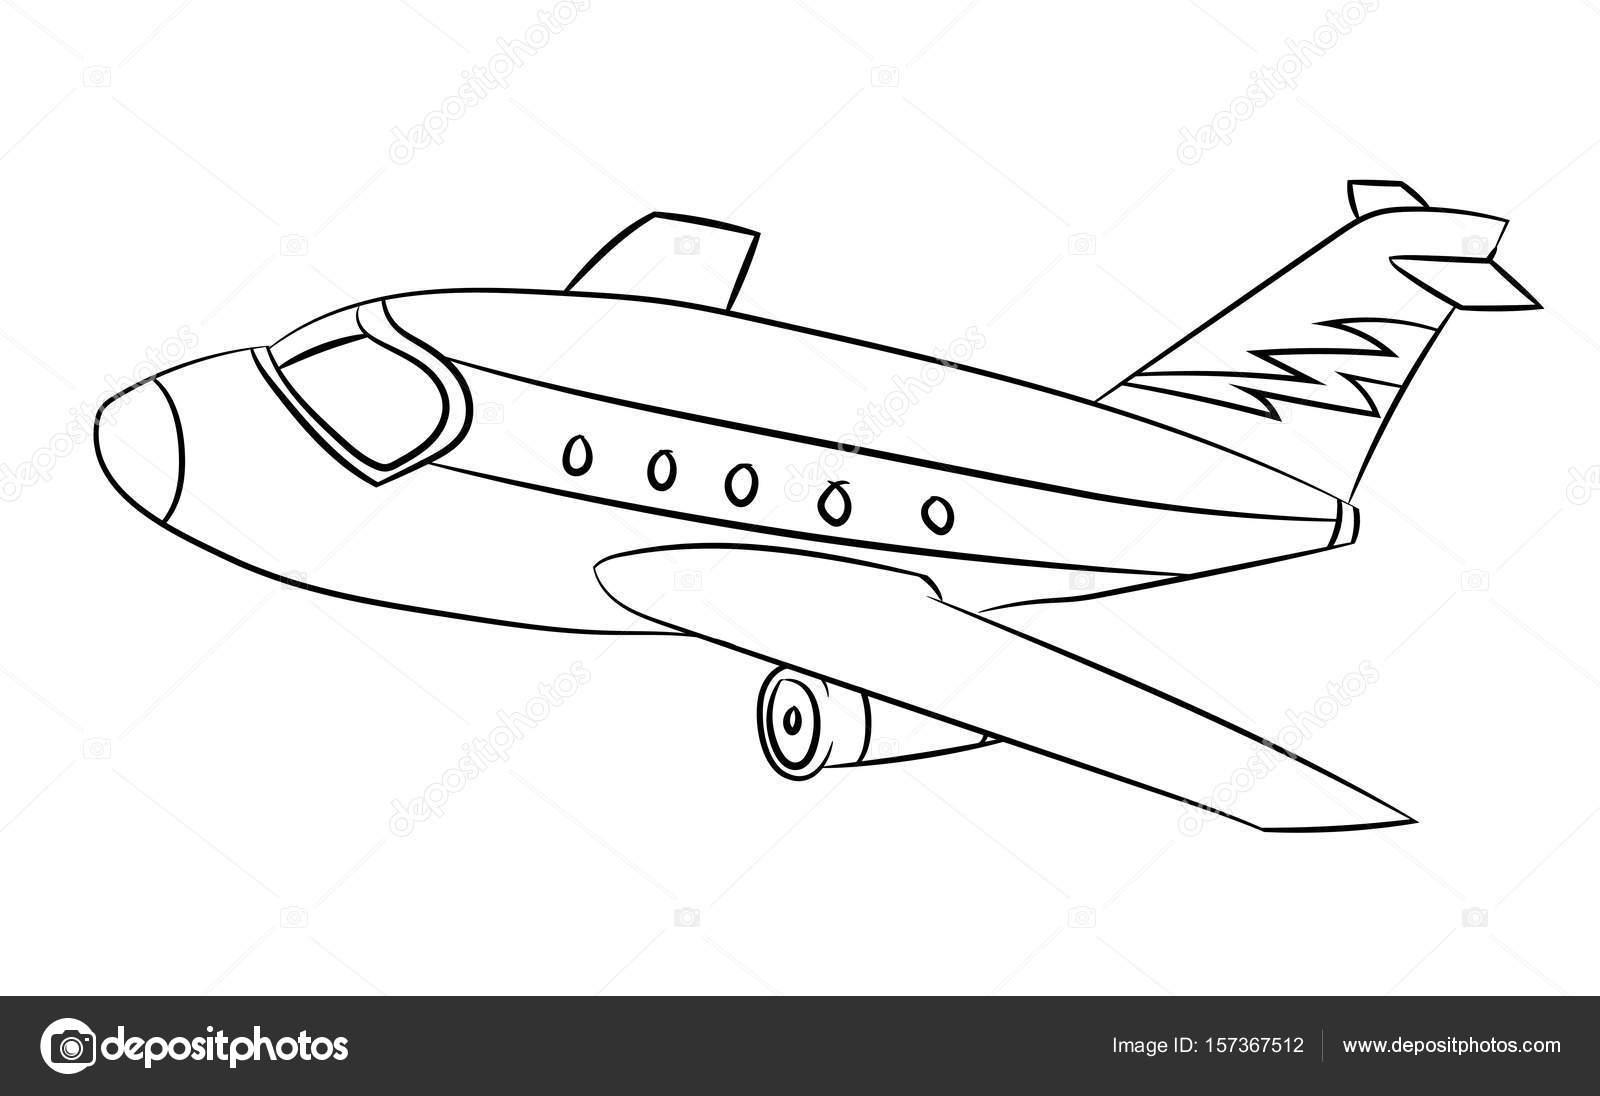 Silueta de avion para colorear | Avión - línea dibujado Vector ...